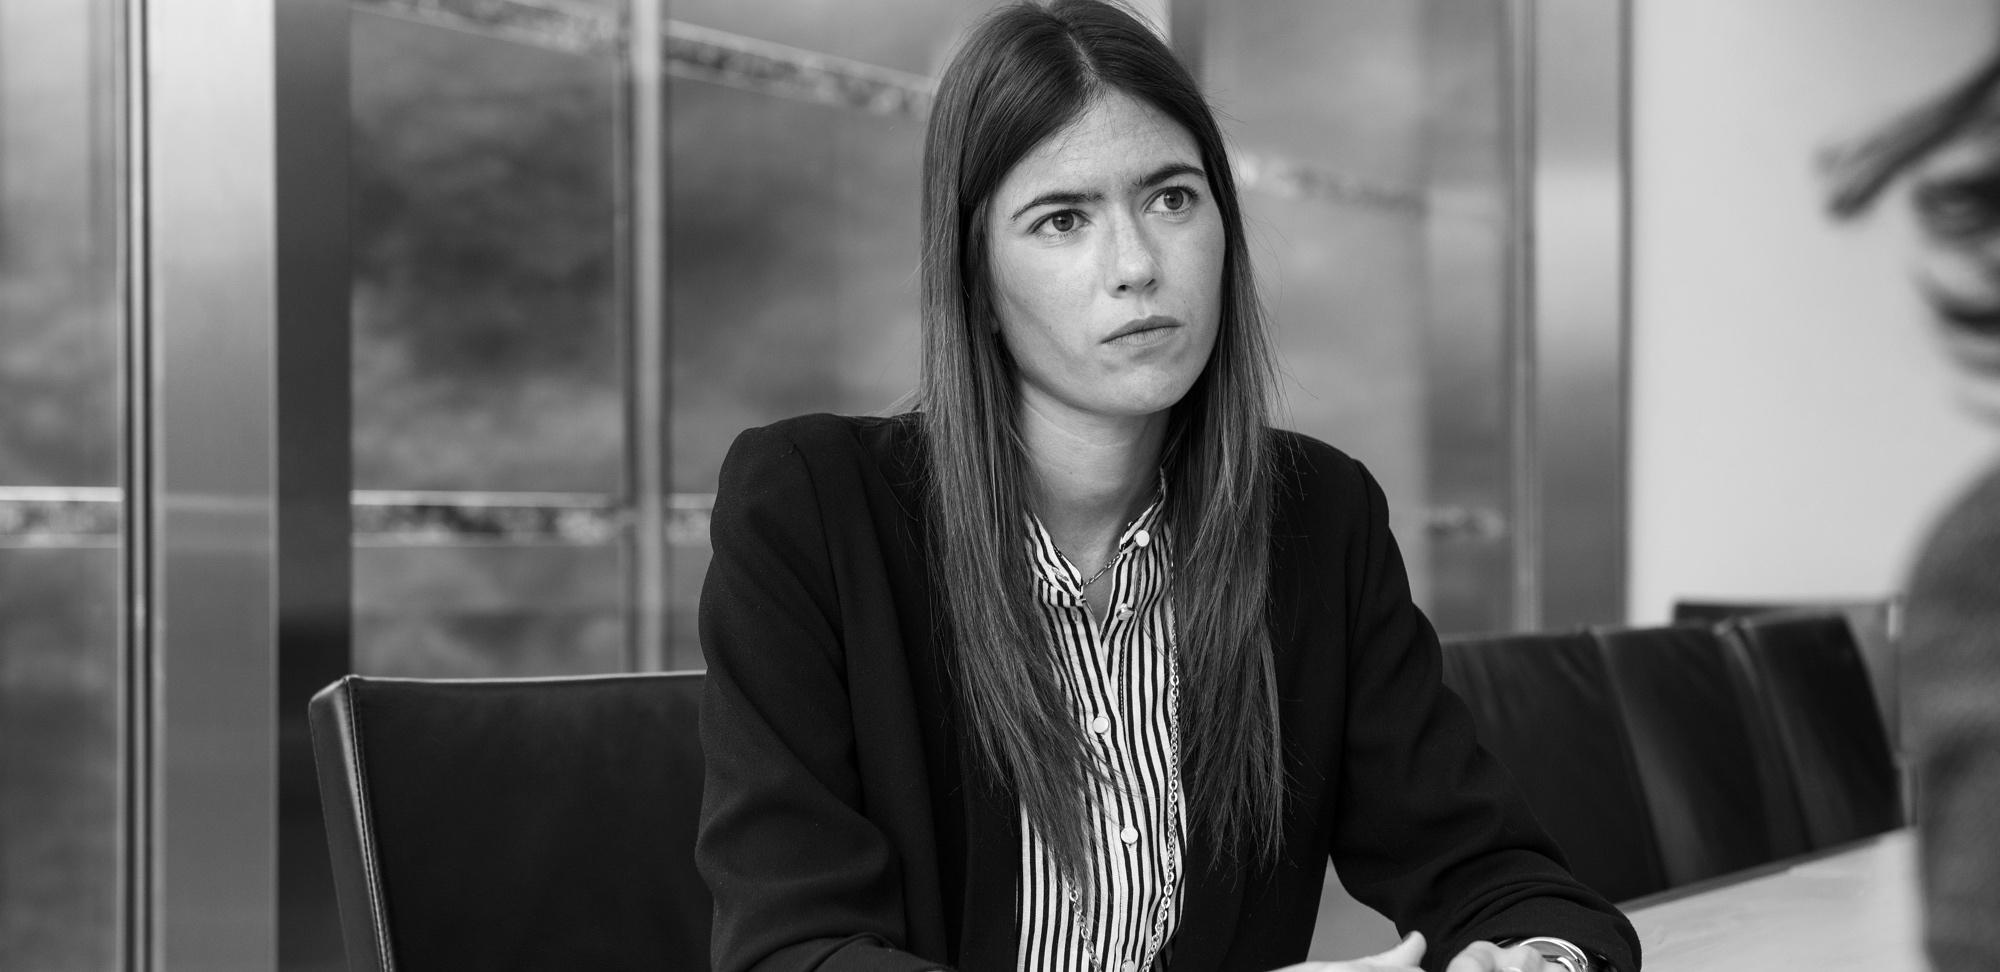 Patricia Alonso-Lamberti